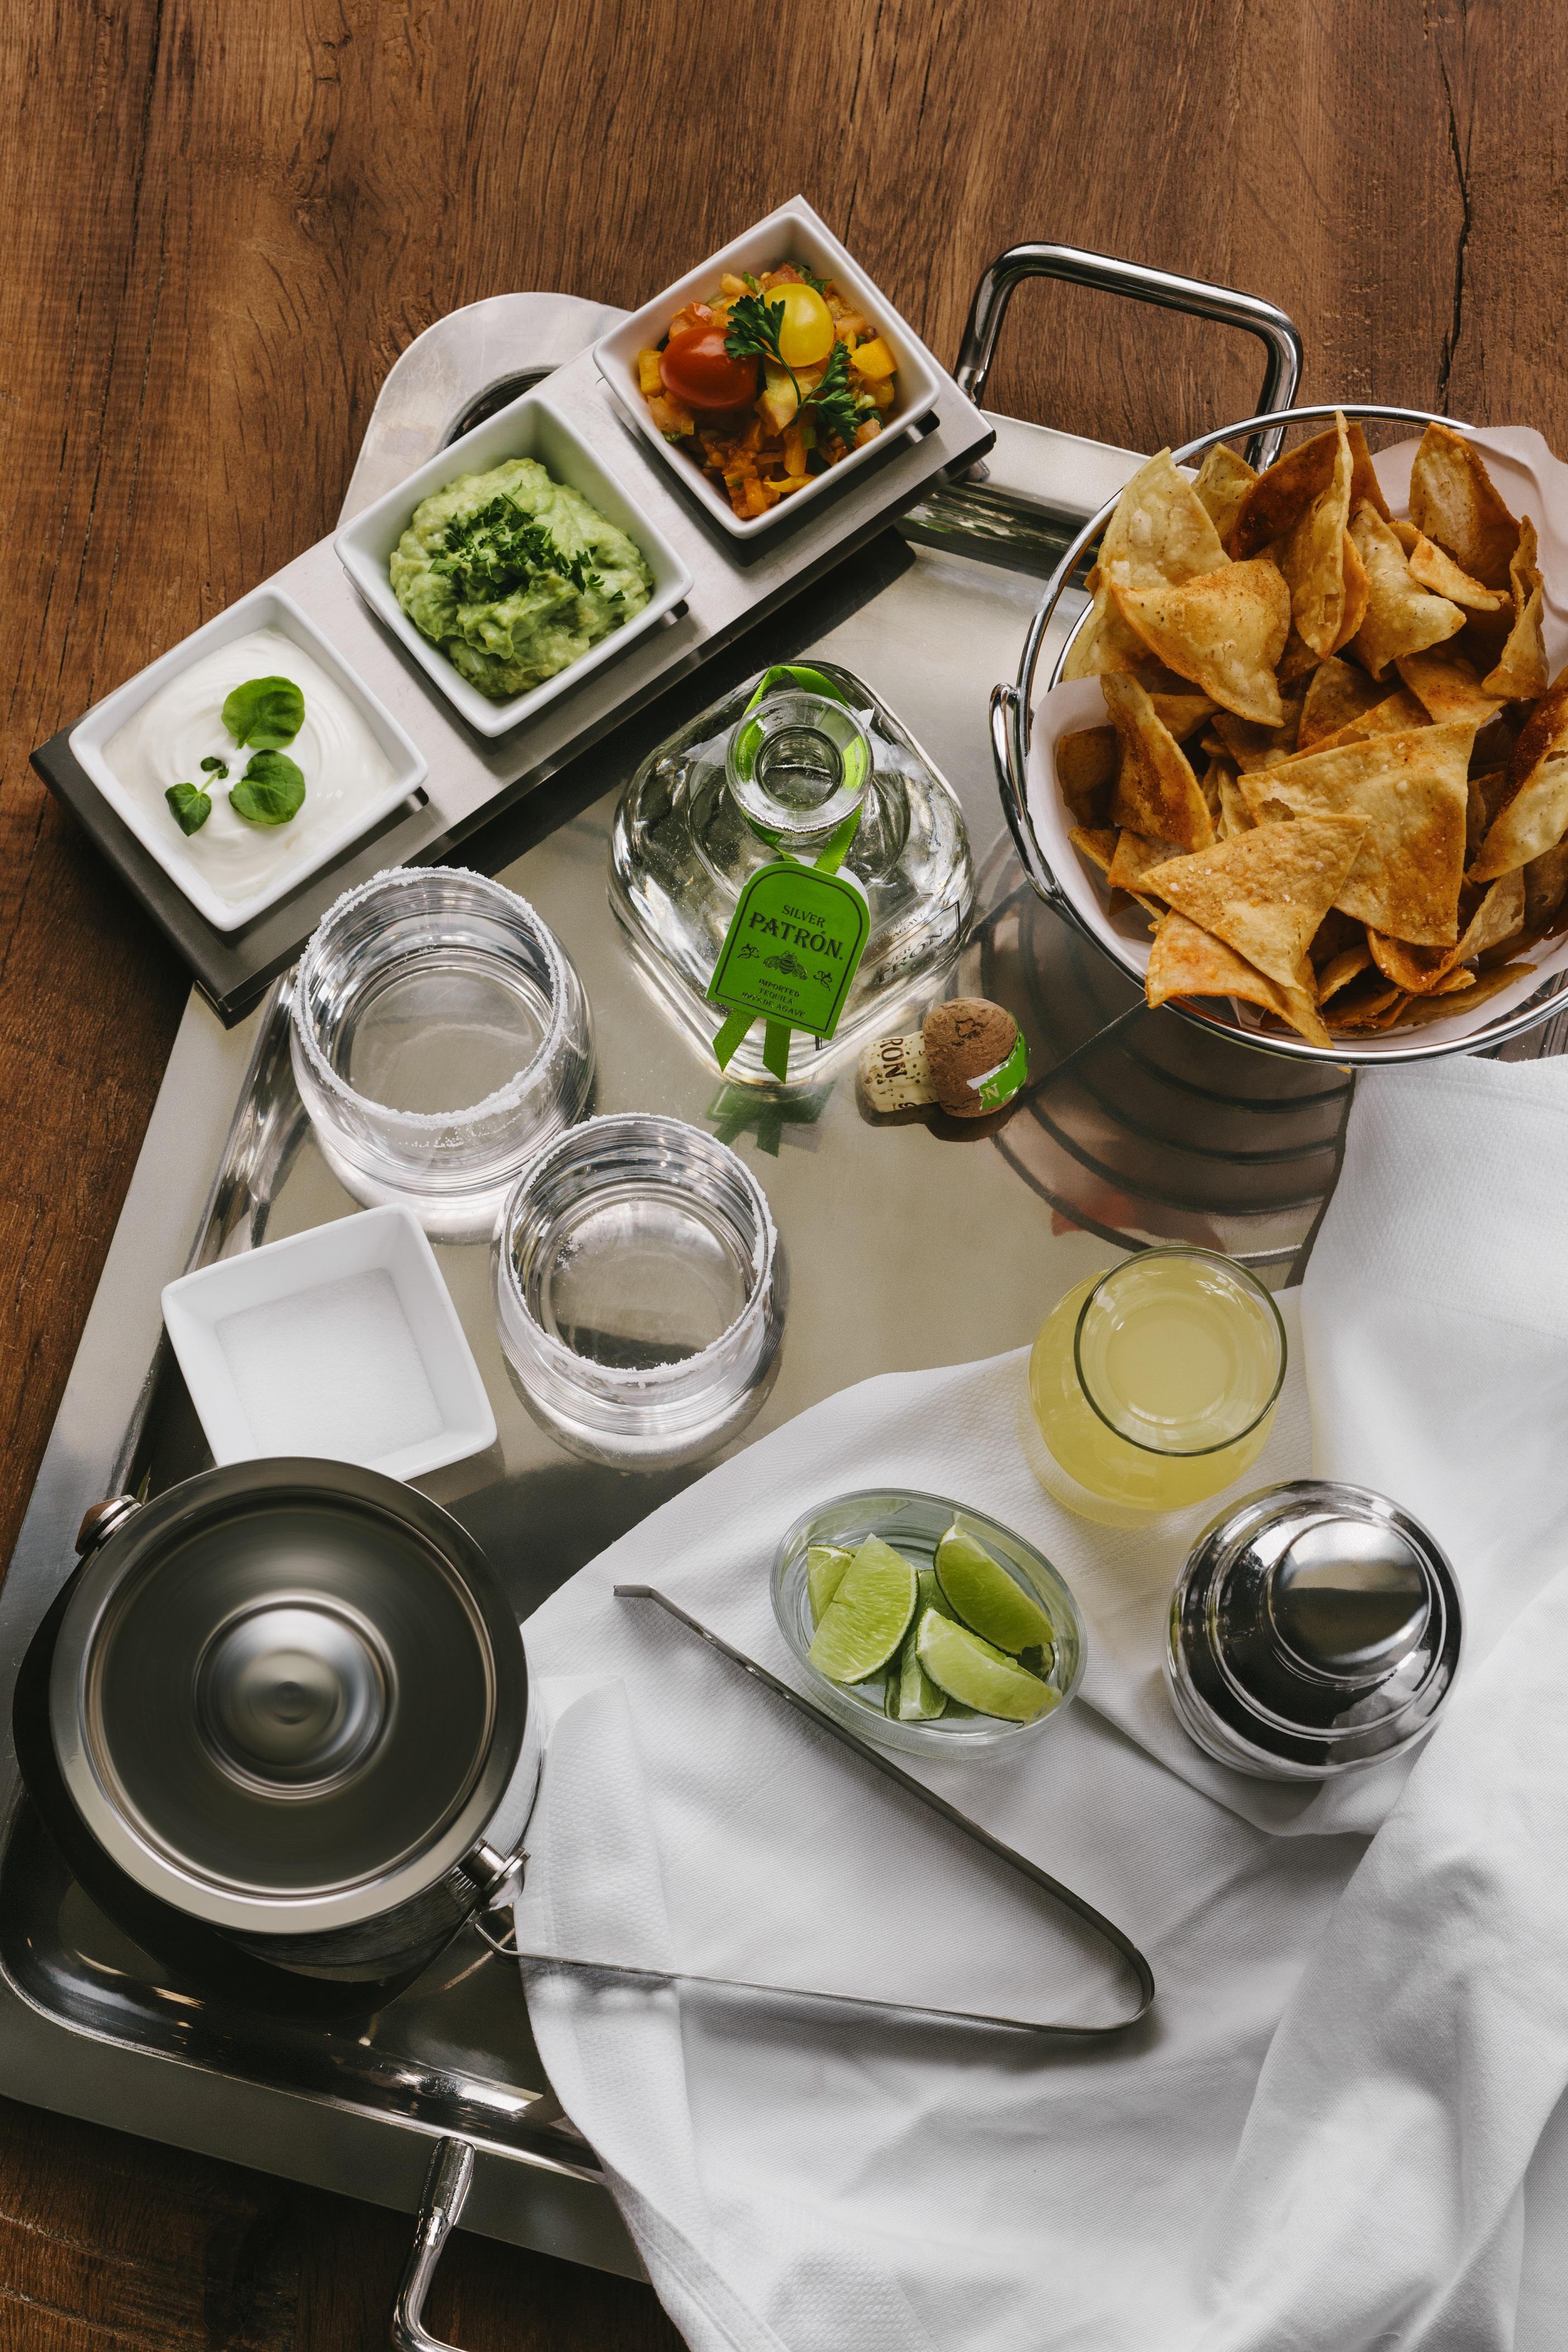 Ultimate margarita serving tray